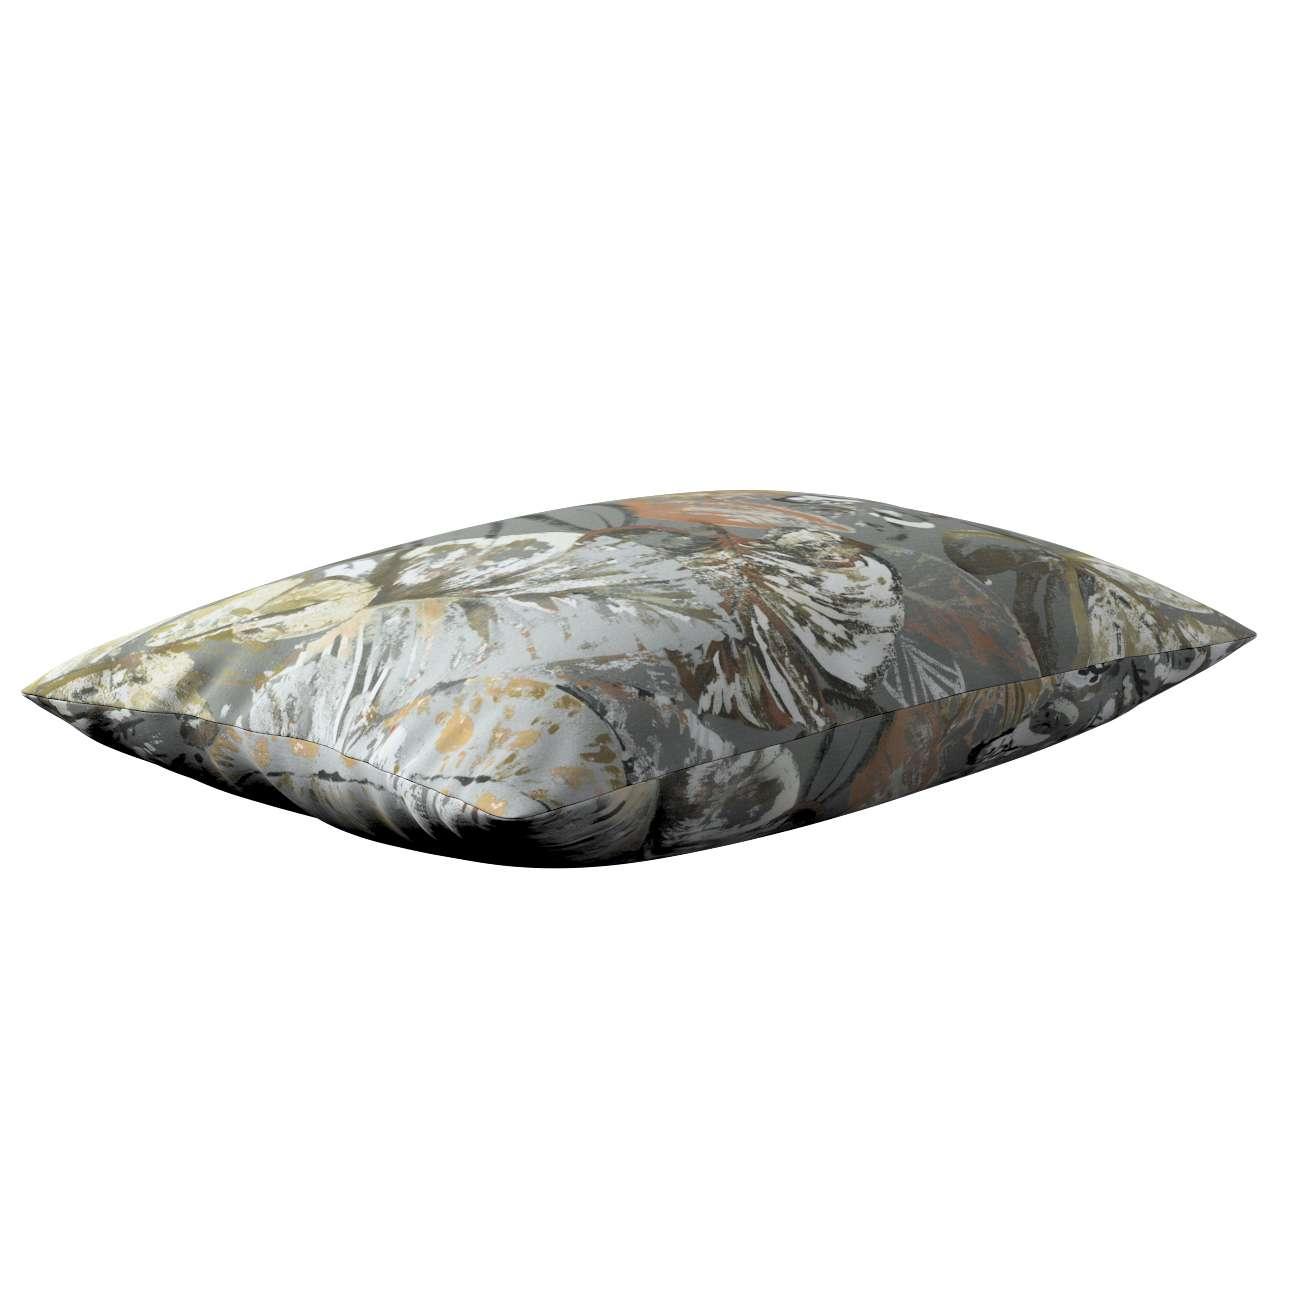 Kinga - potah na polštář jednoduchý obdélníkový v kolekci Abigail, látka: 143-19